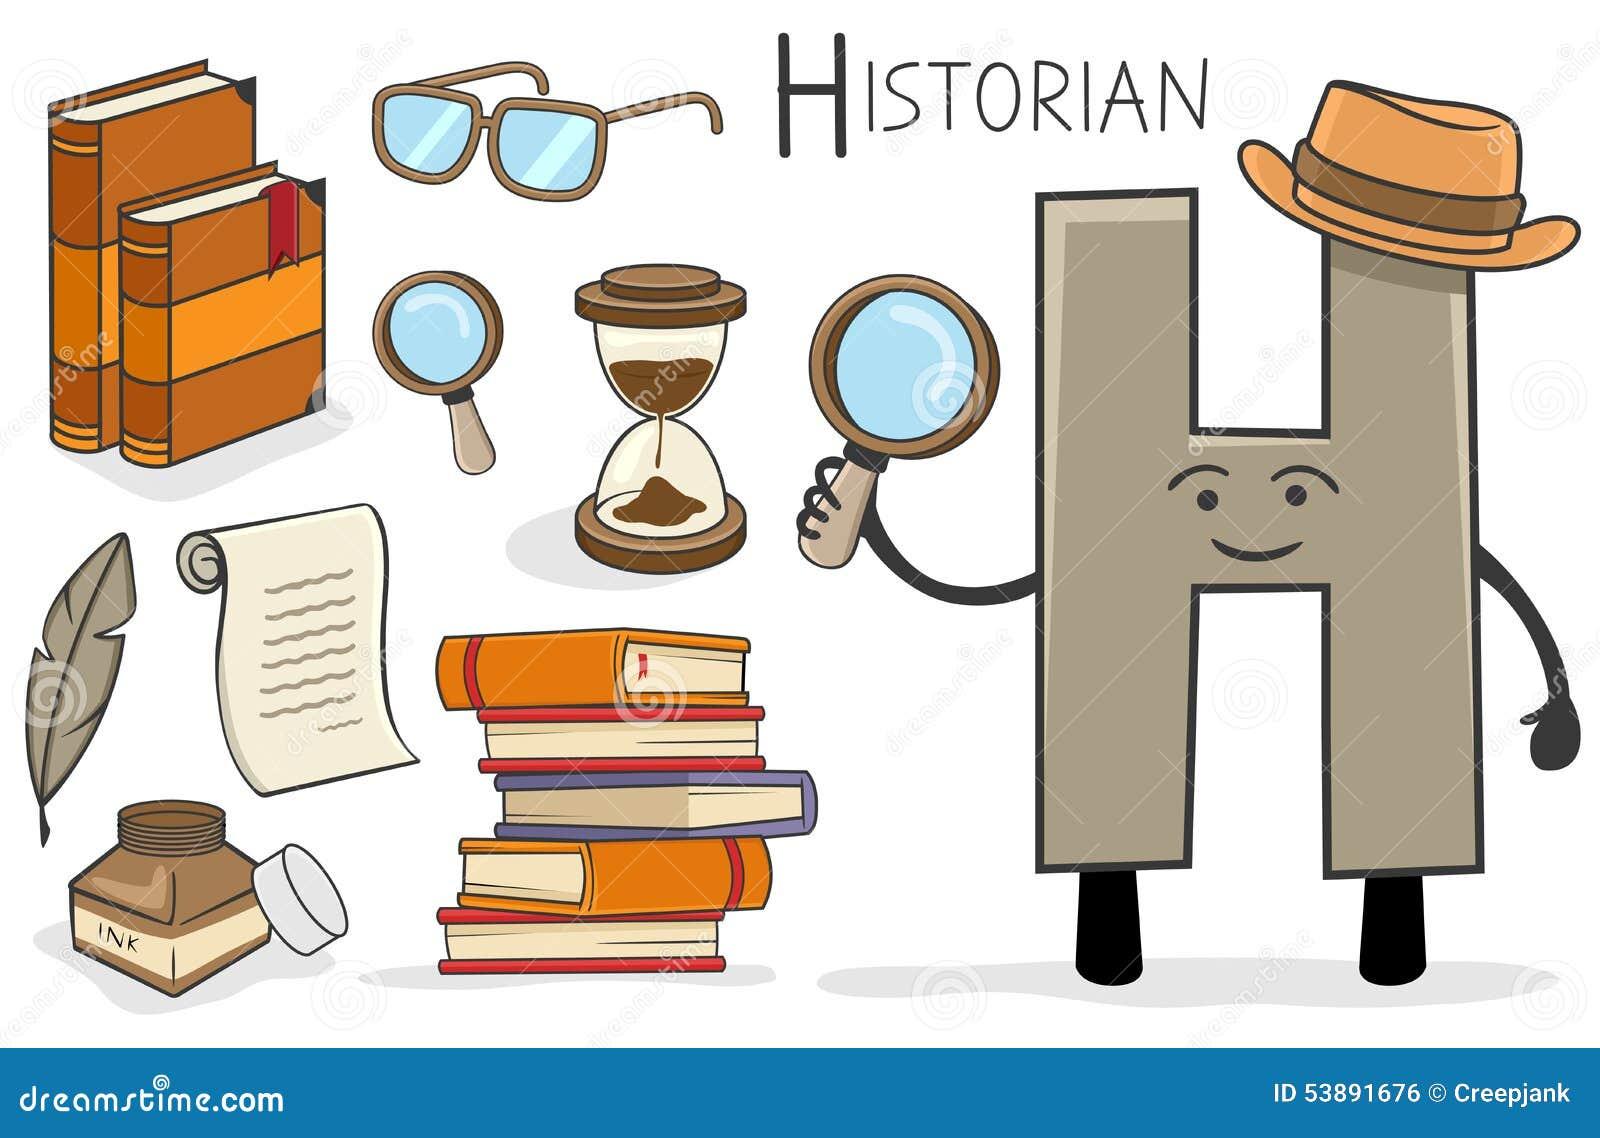 historian stock illustrations 209 historian stock illustrations